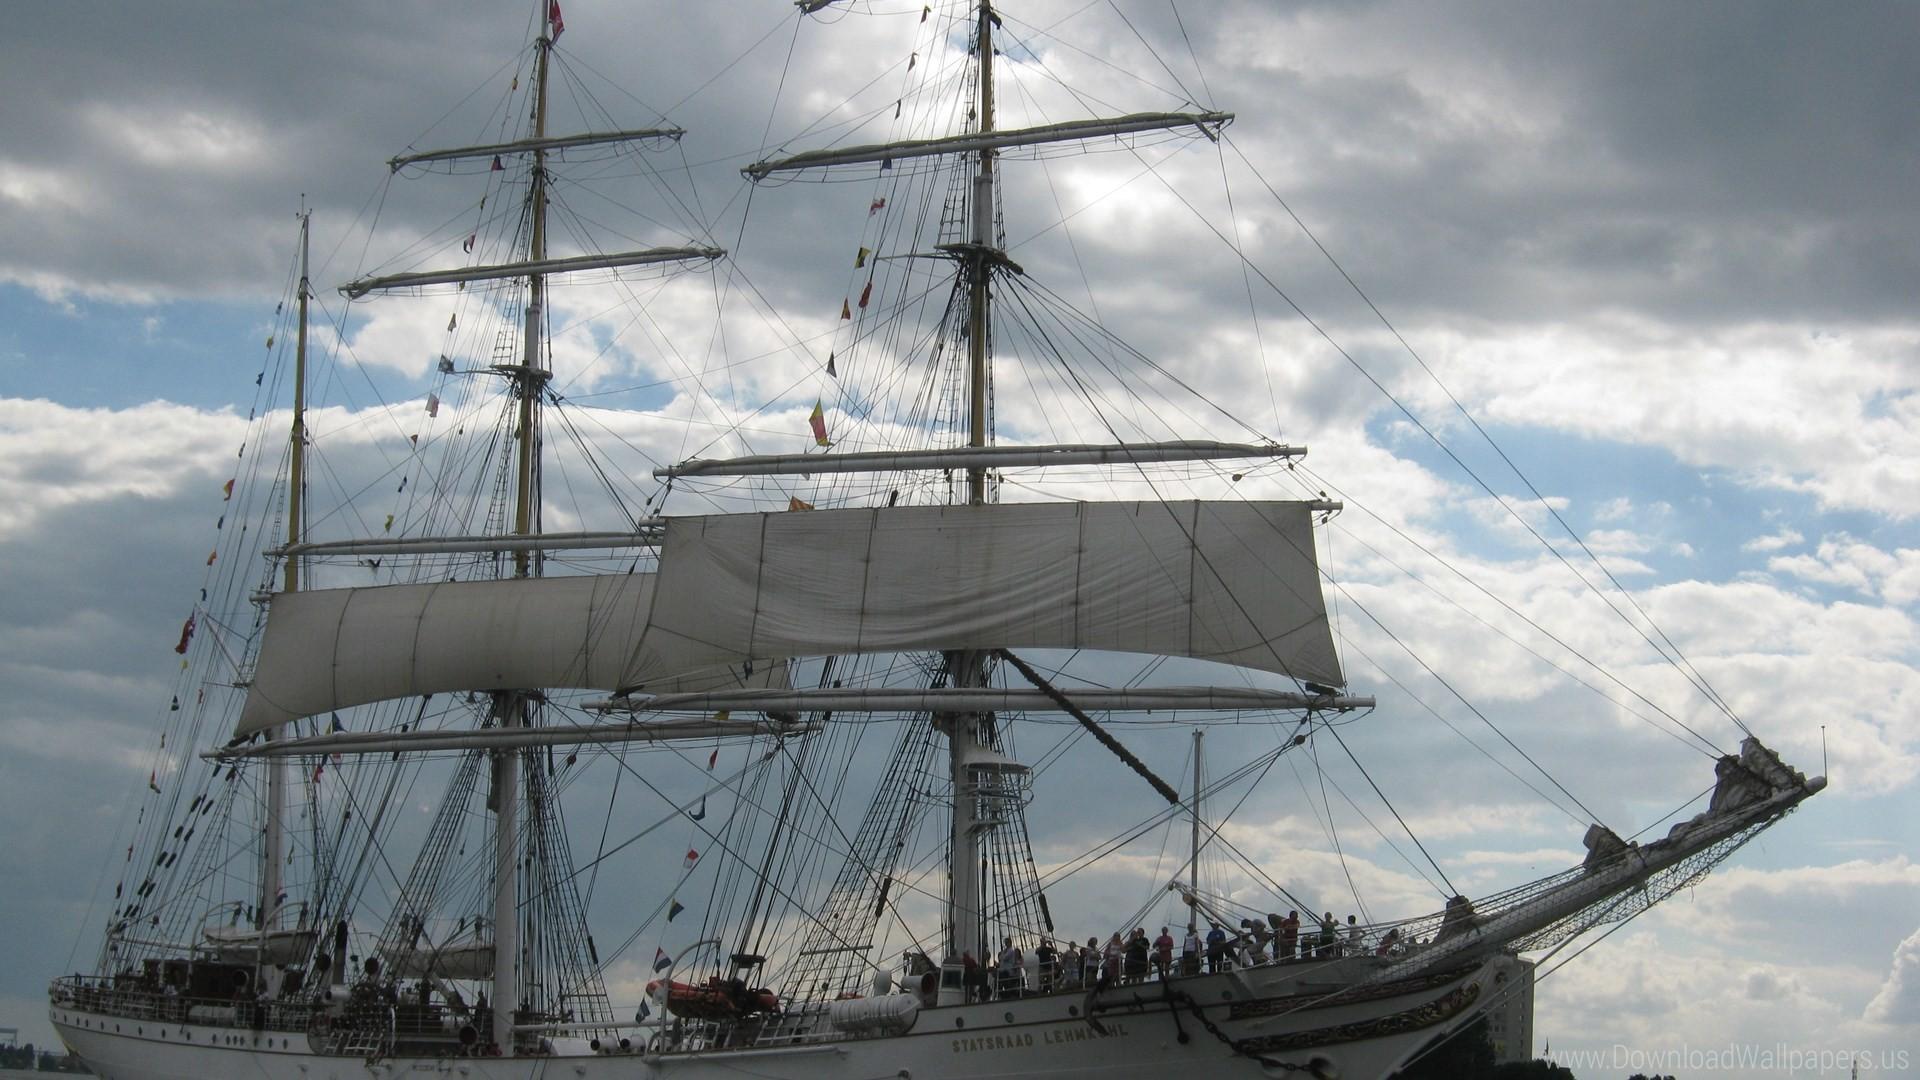 Res: 1920x1080, Download Widescreen 16:9  - Belgium, Tall Ships Race Antwerpen  2010 Wallpaper